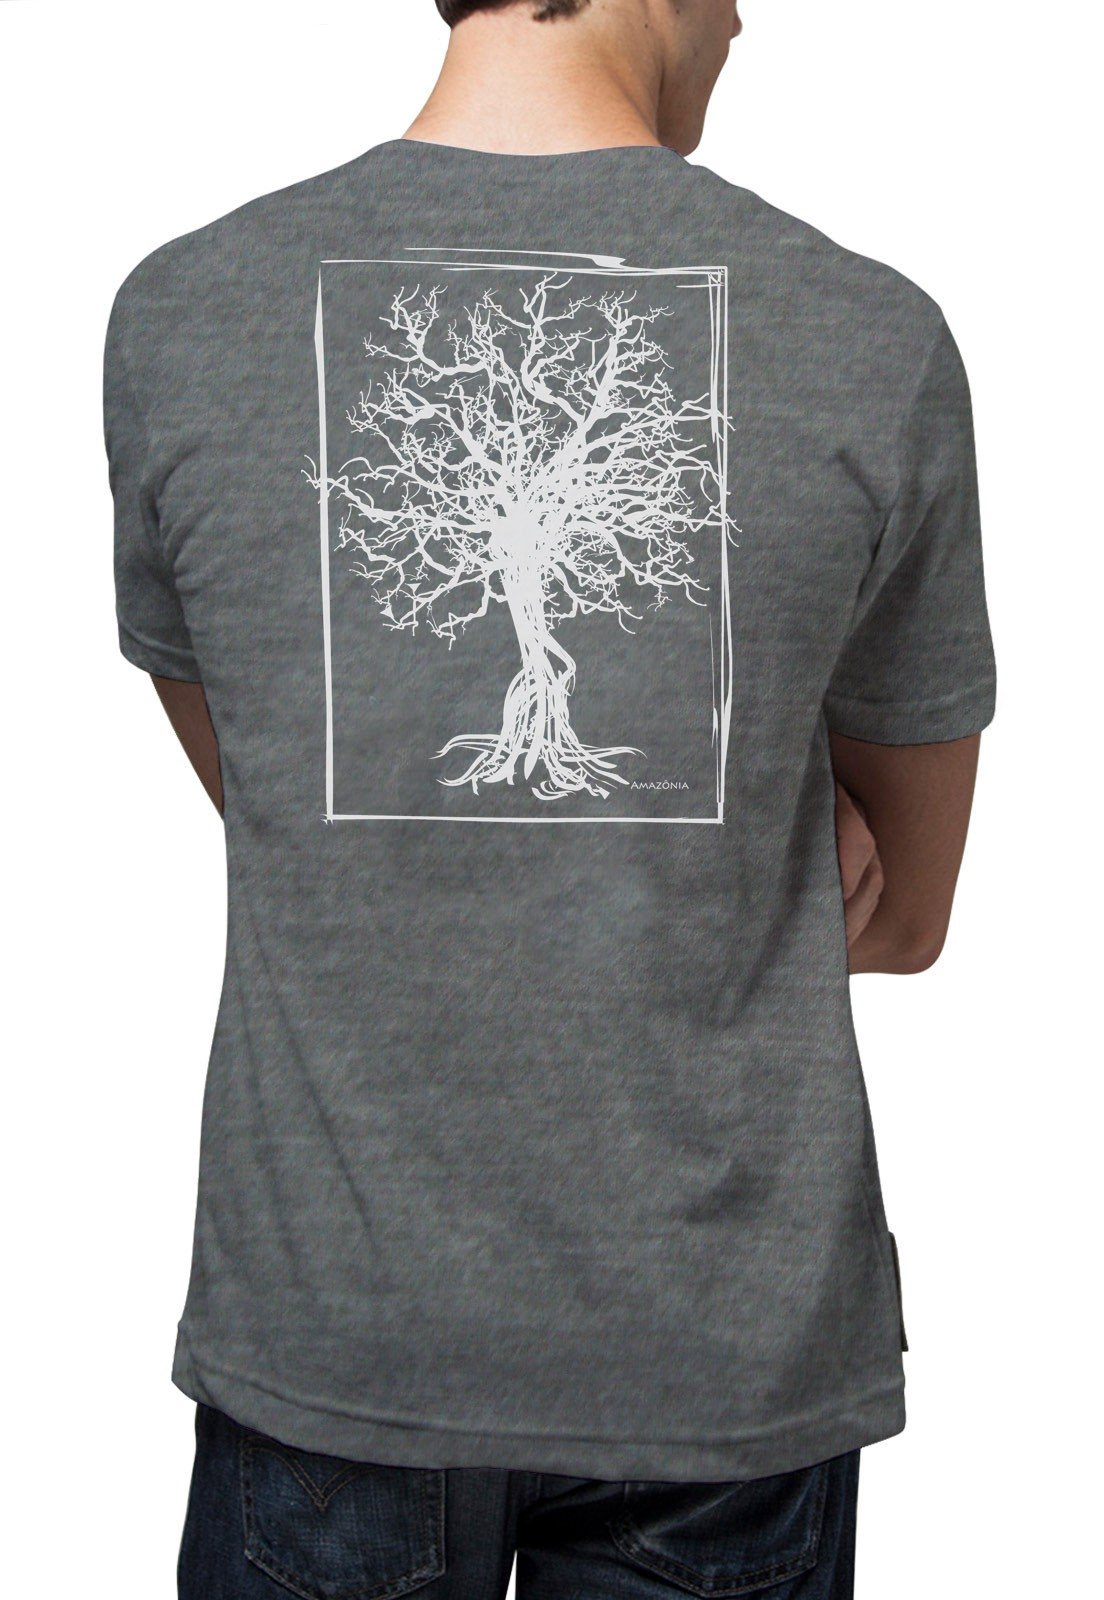 Camiseta Amazônia Quadro Desmatamento - Cinza Mescla